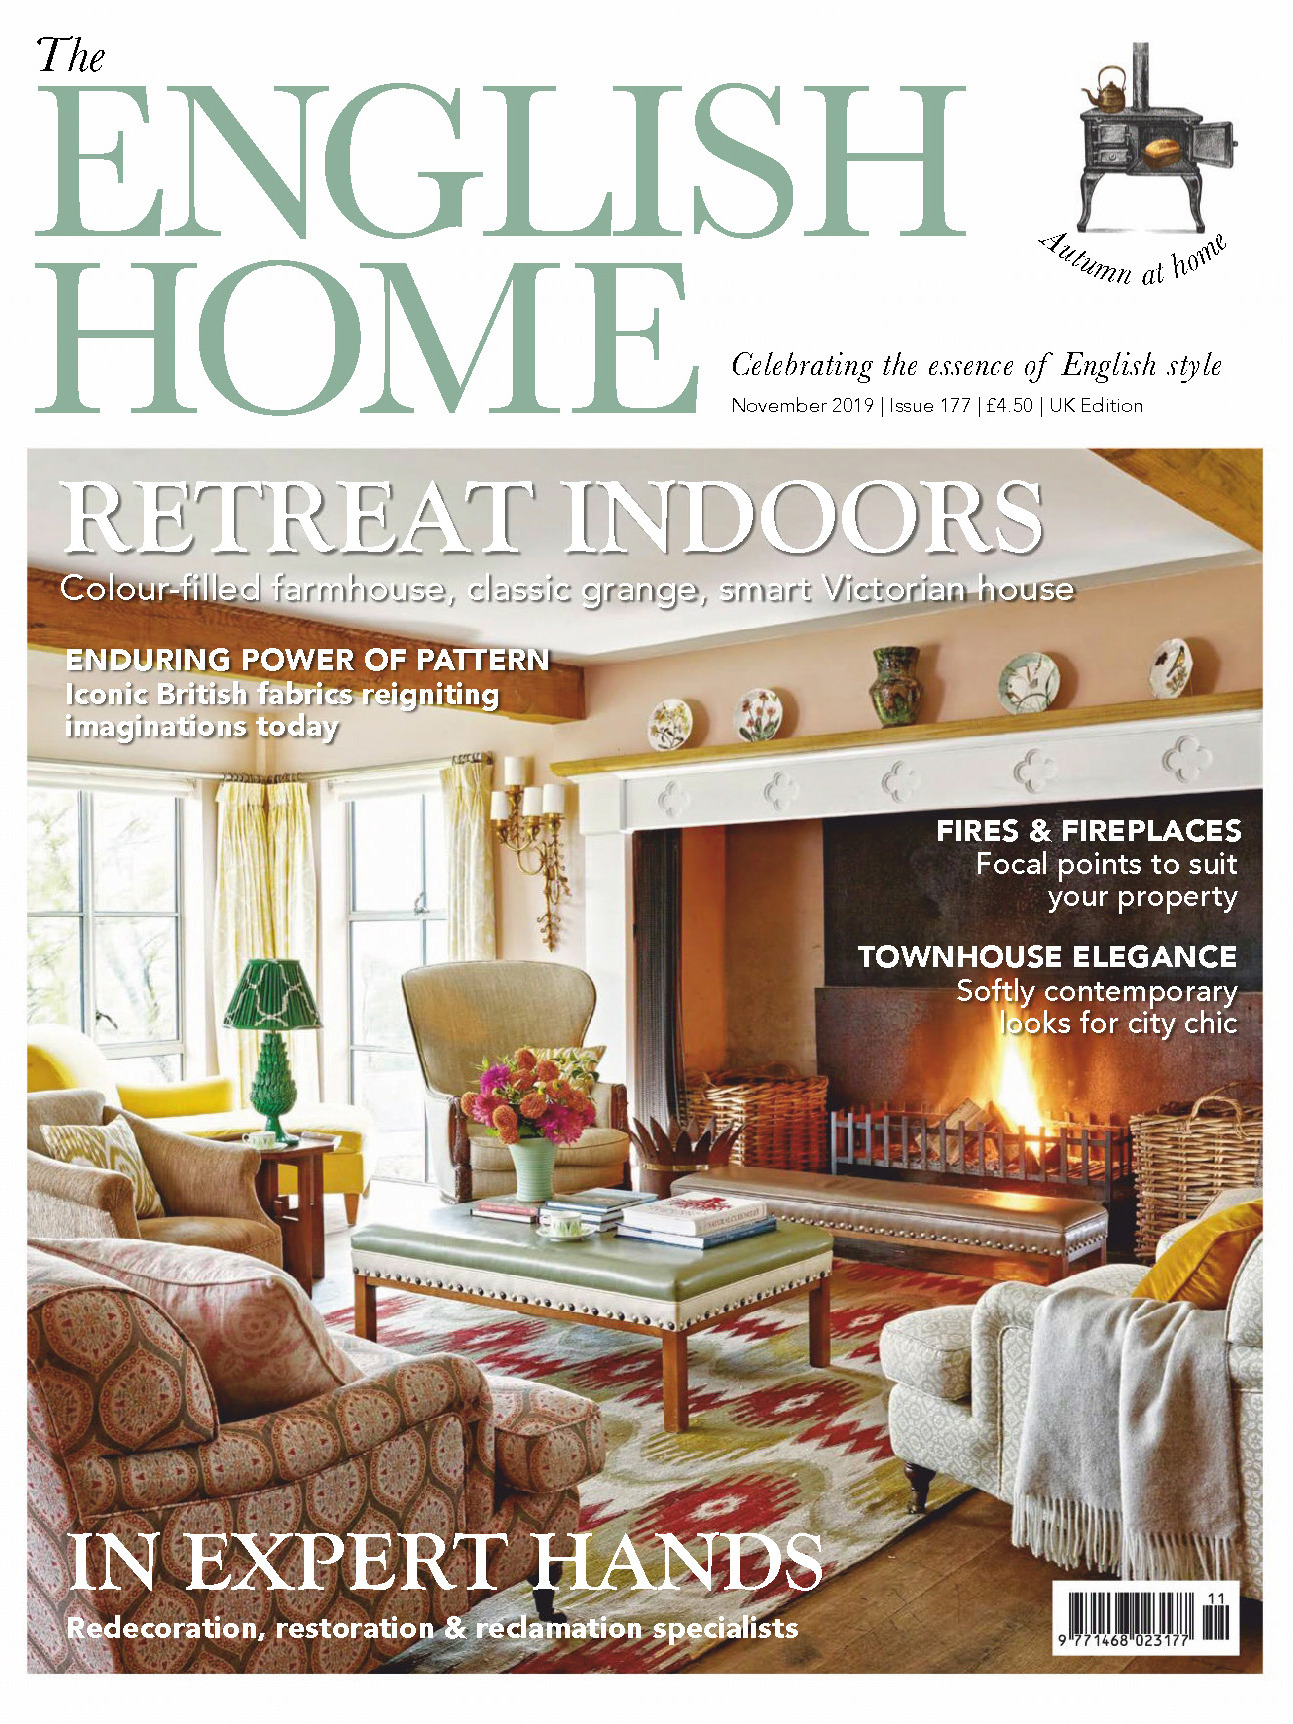 《The English Home》英国版时尚家居杂志2019年11月号